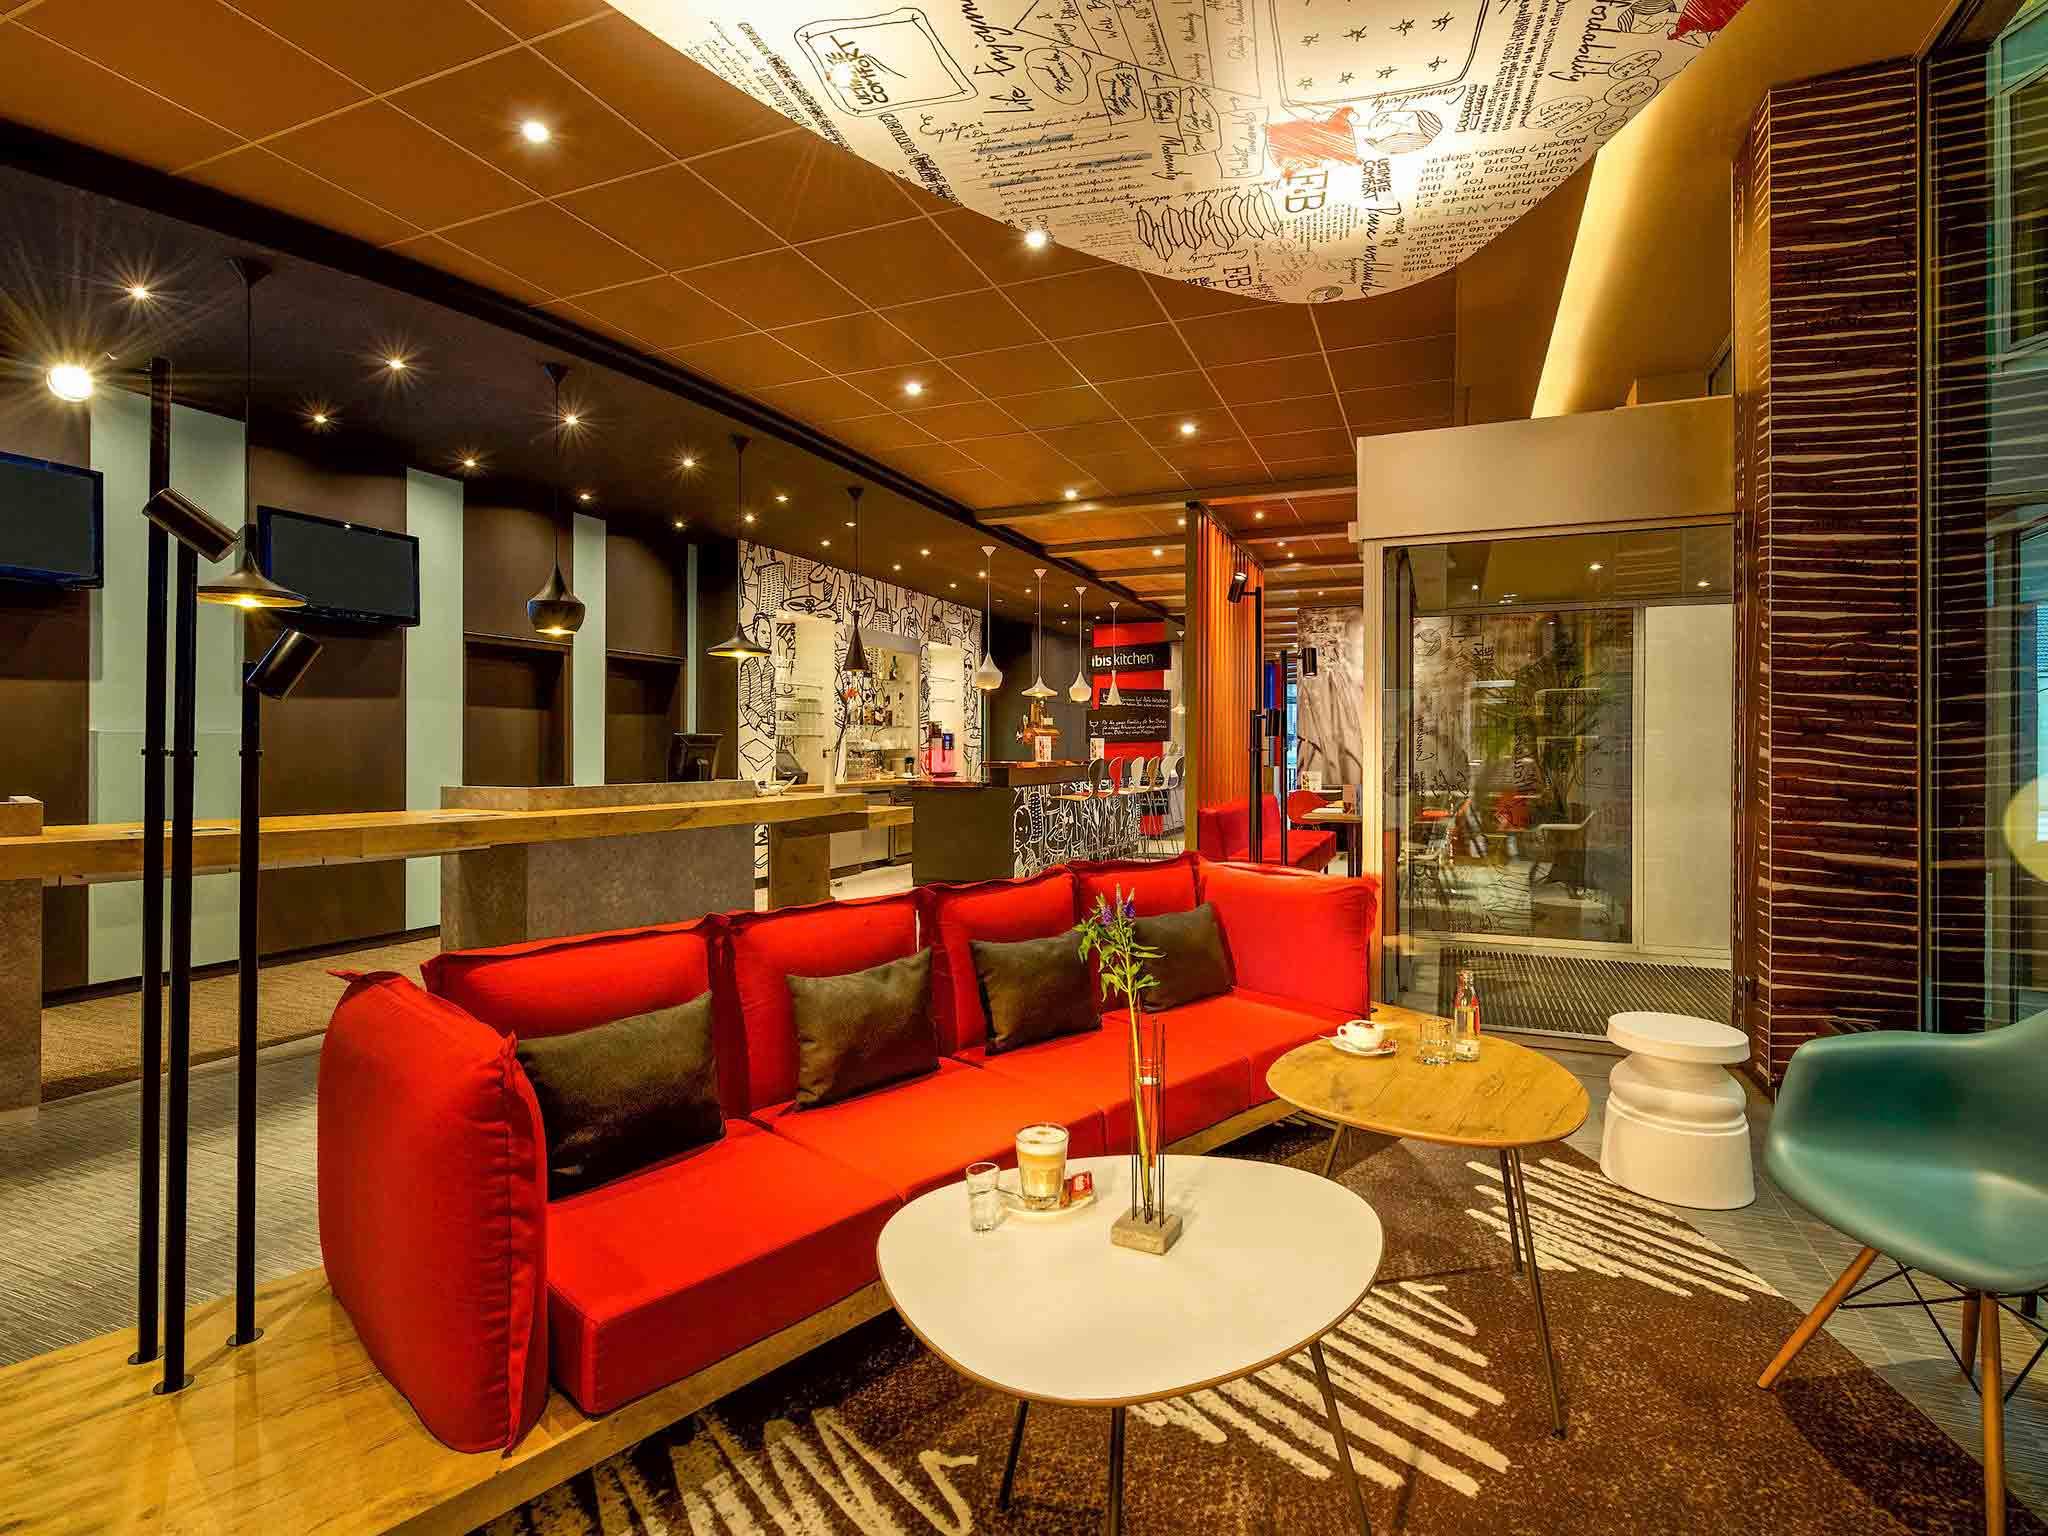 Hotel a hamburg ibis hamburg alsterring